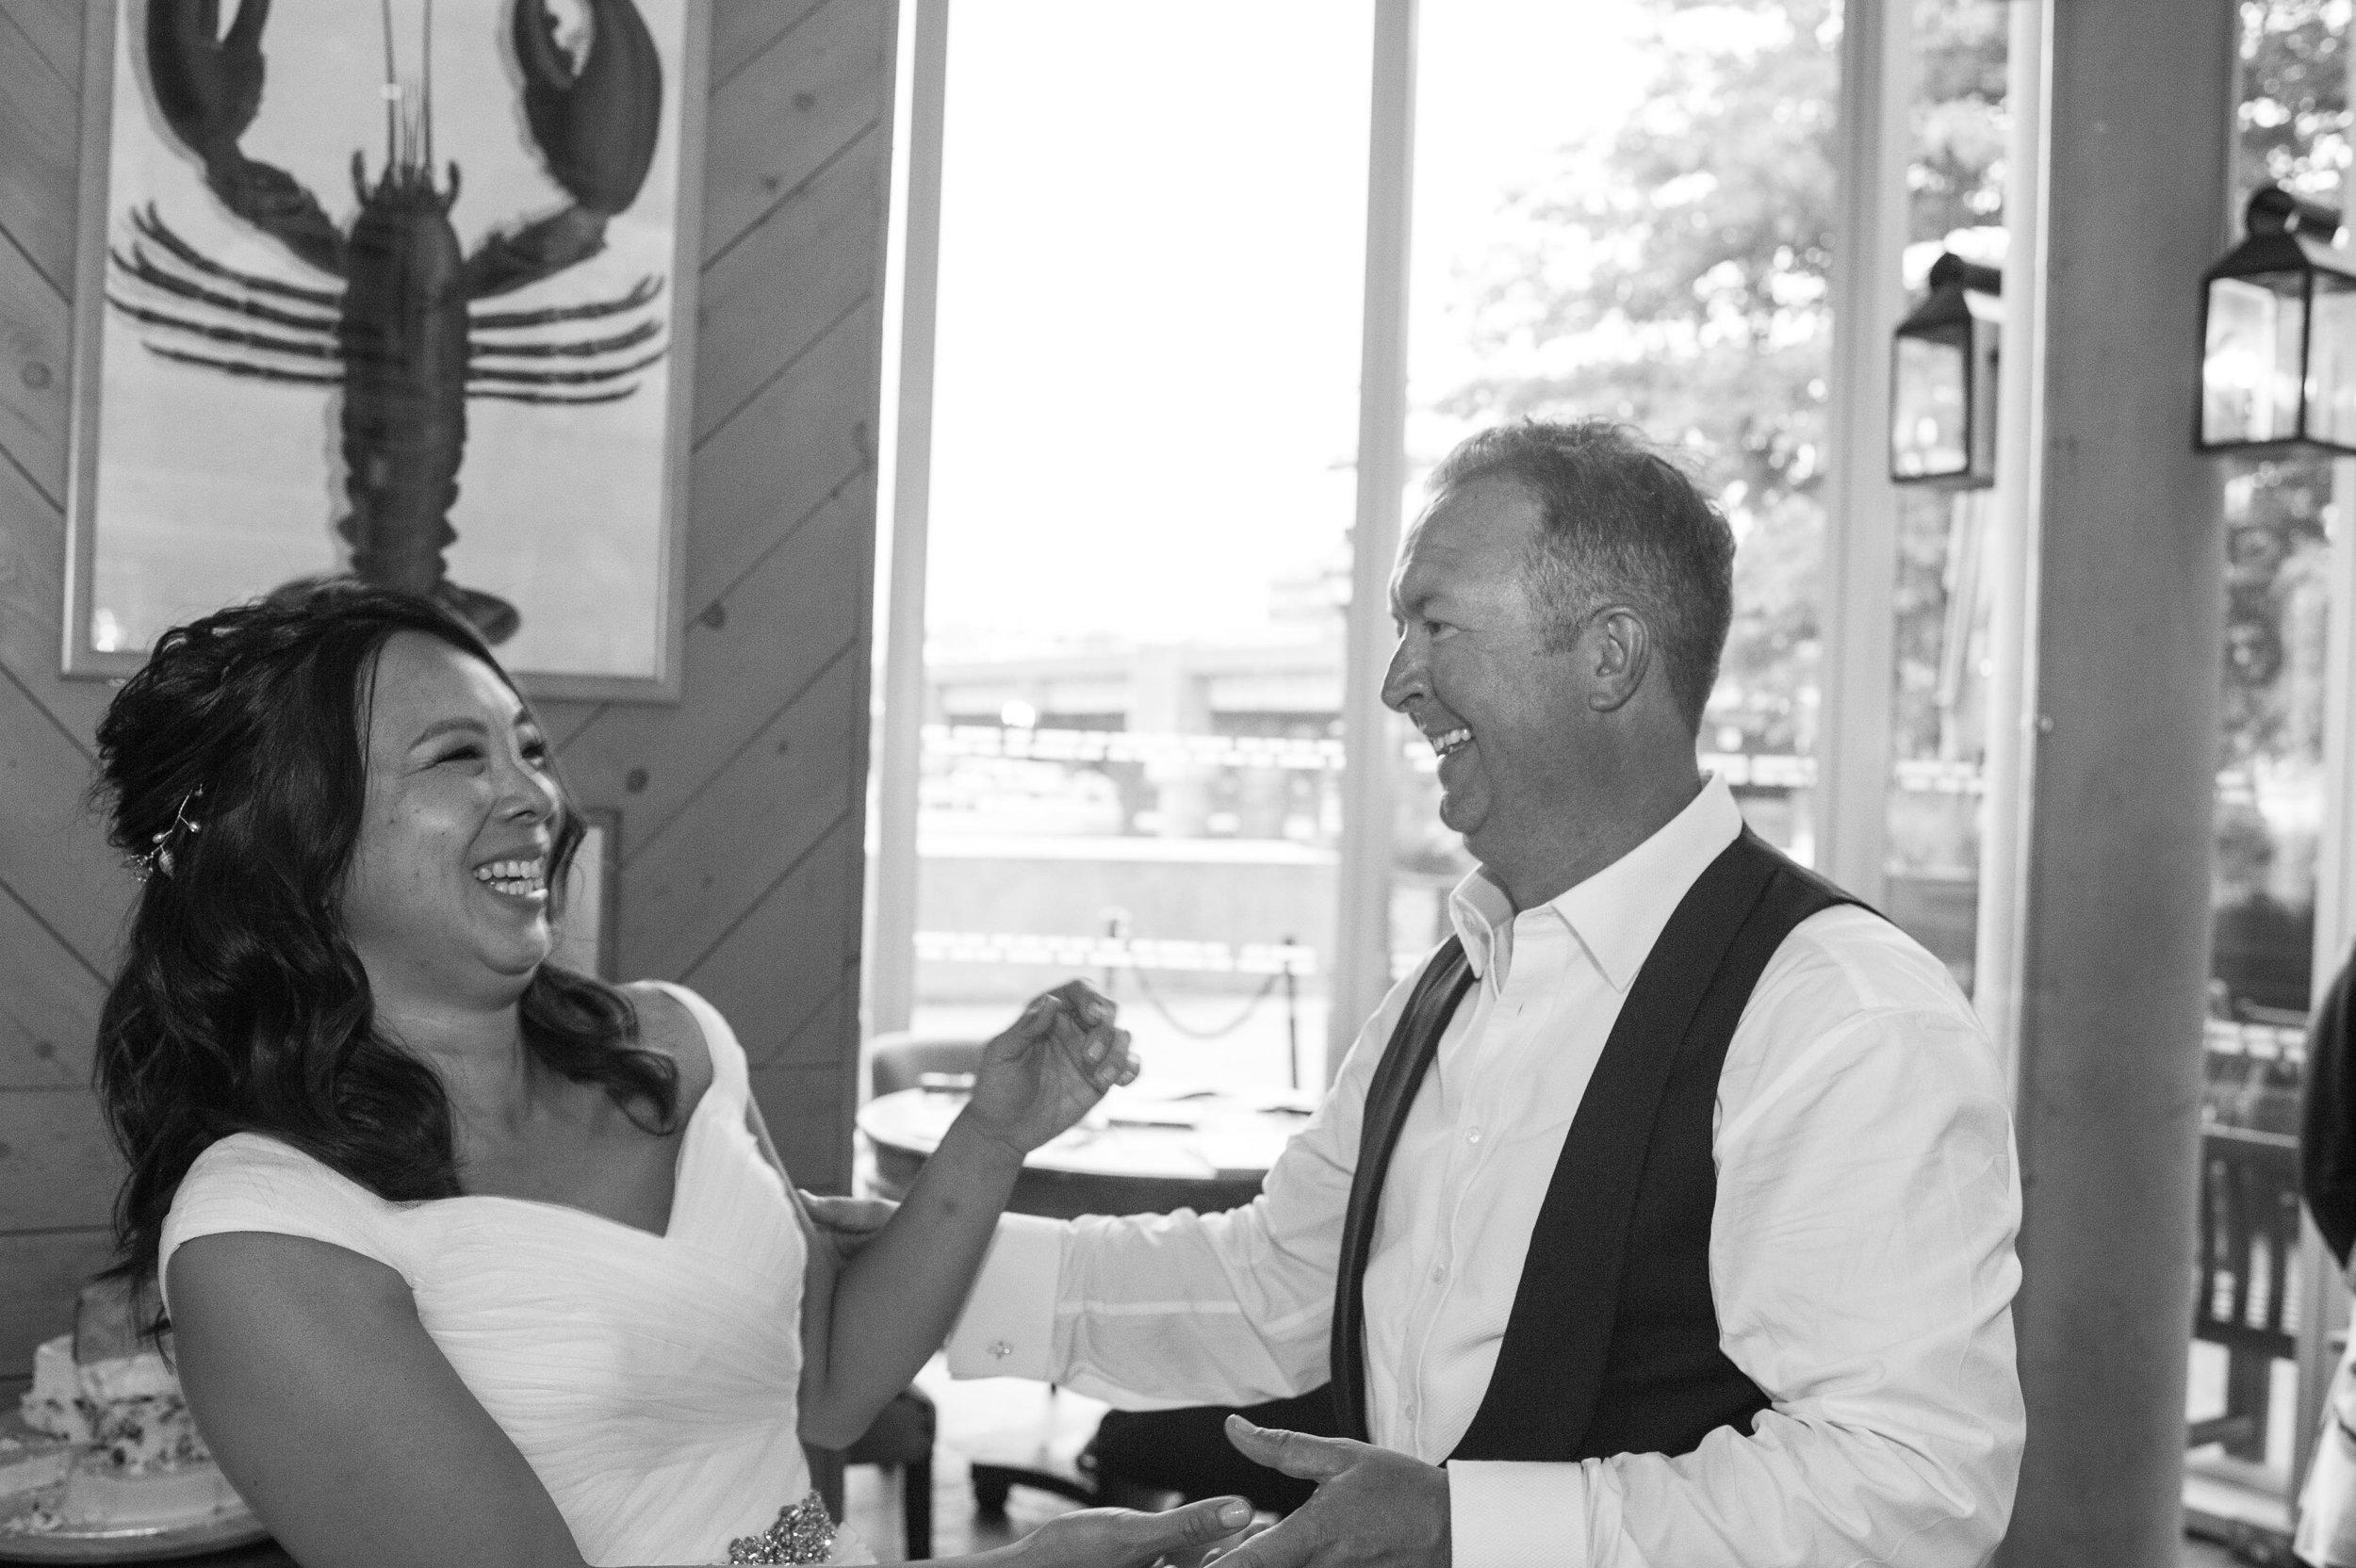 D&M_Marylebone Town Hall Wedding (234 of 239).jpg